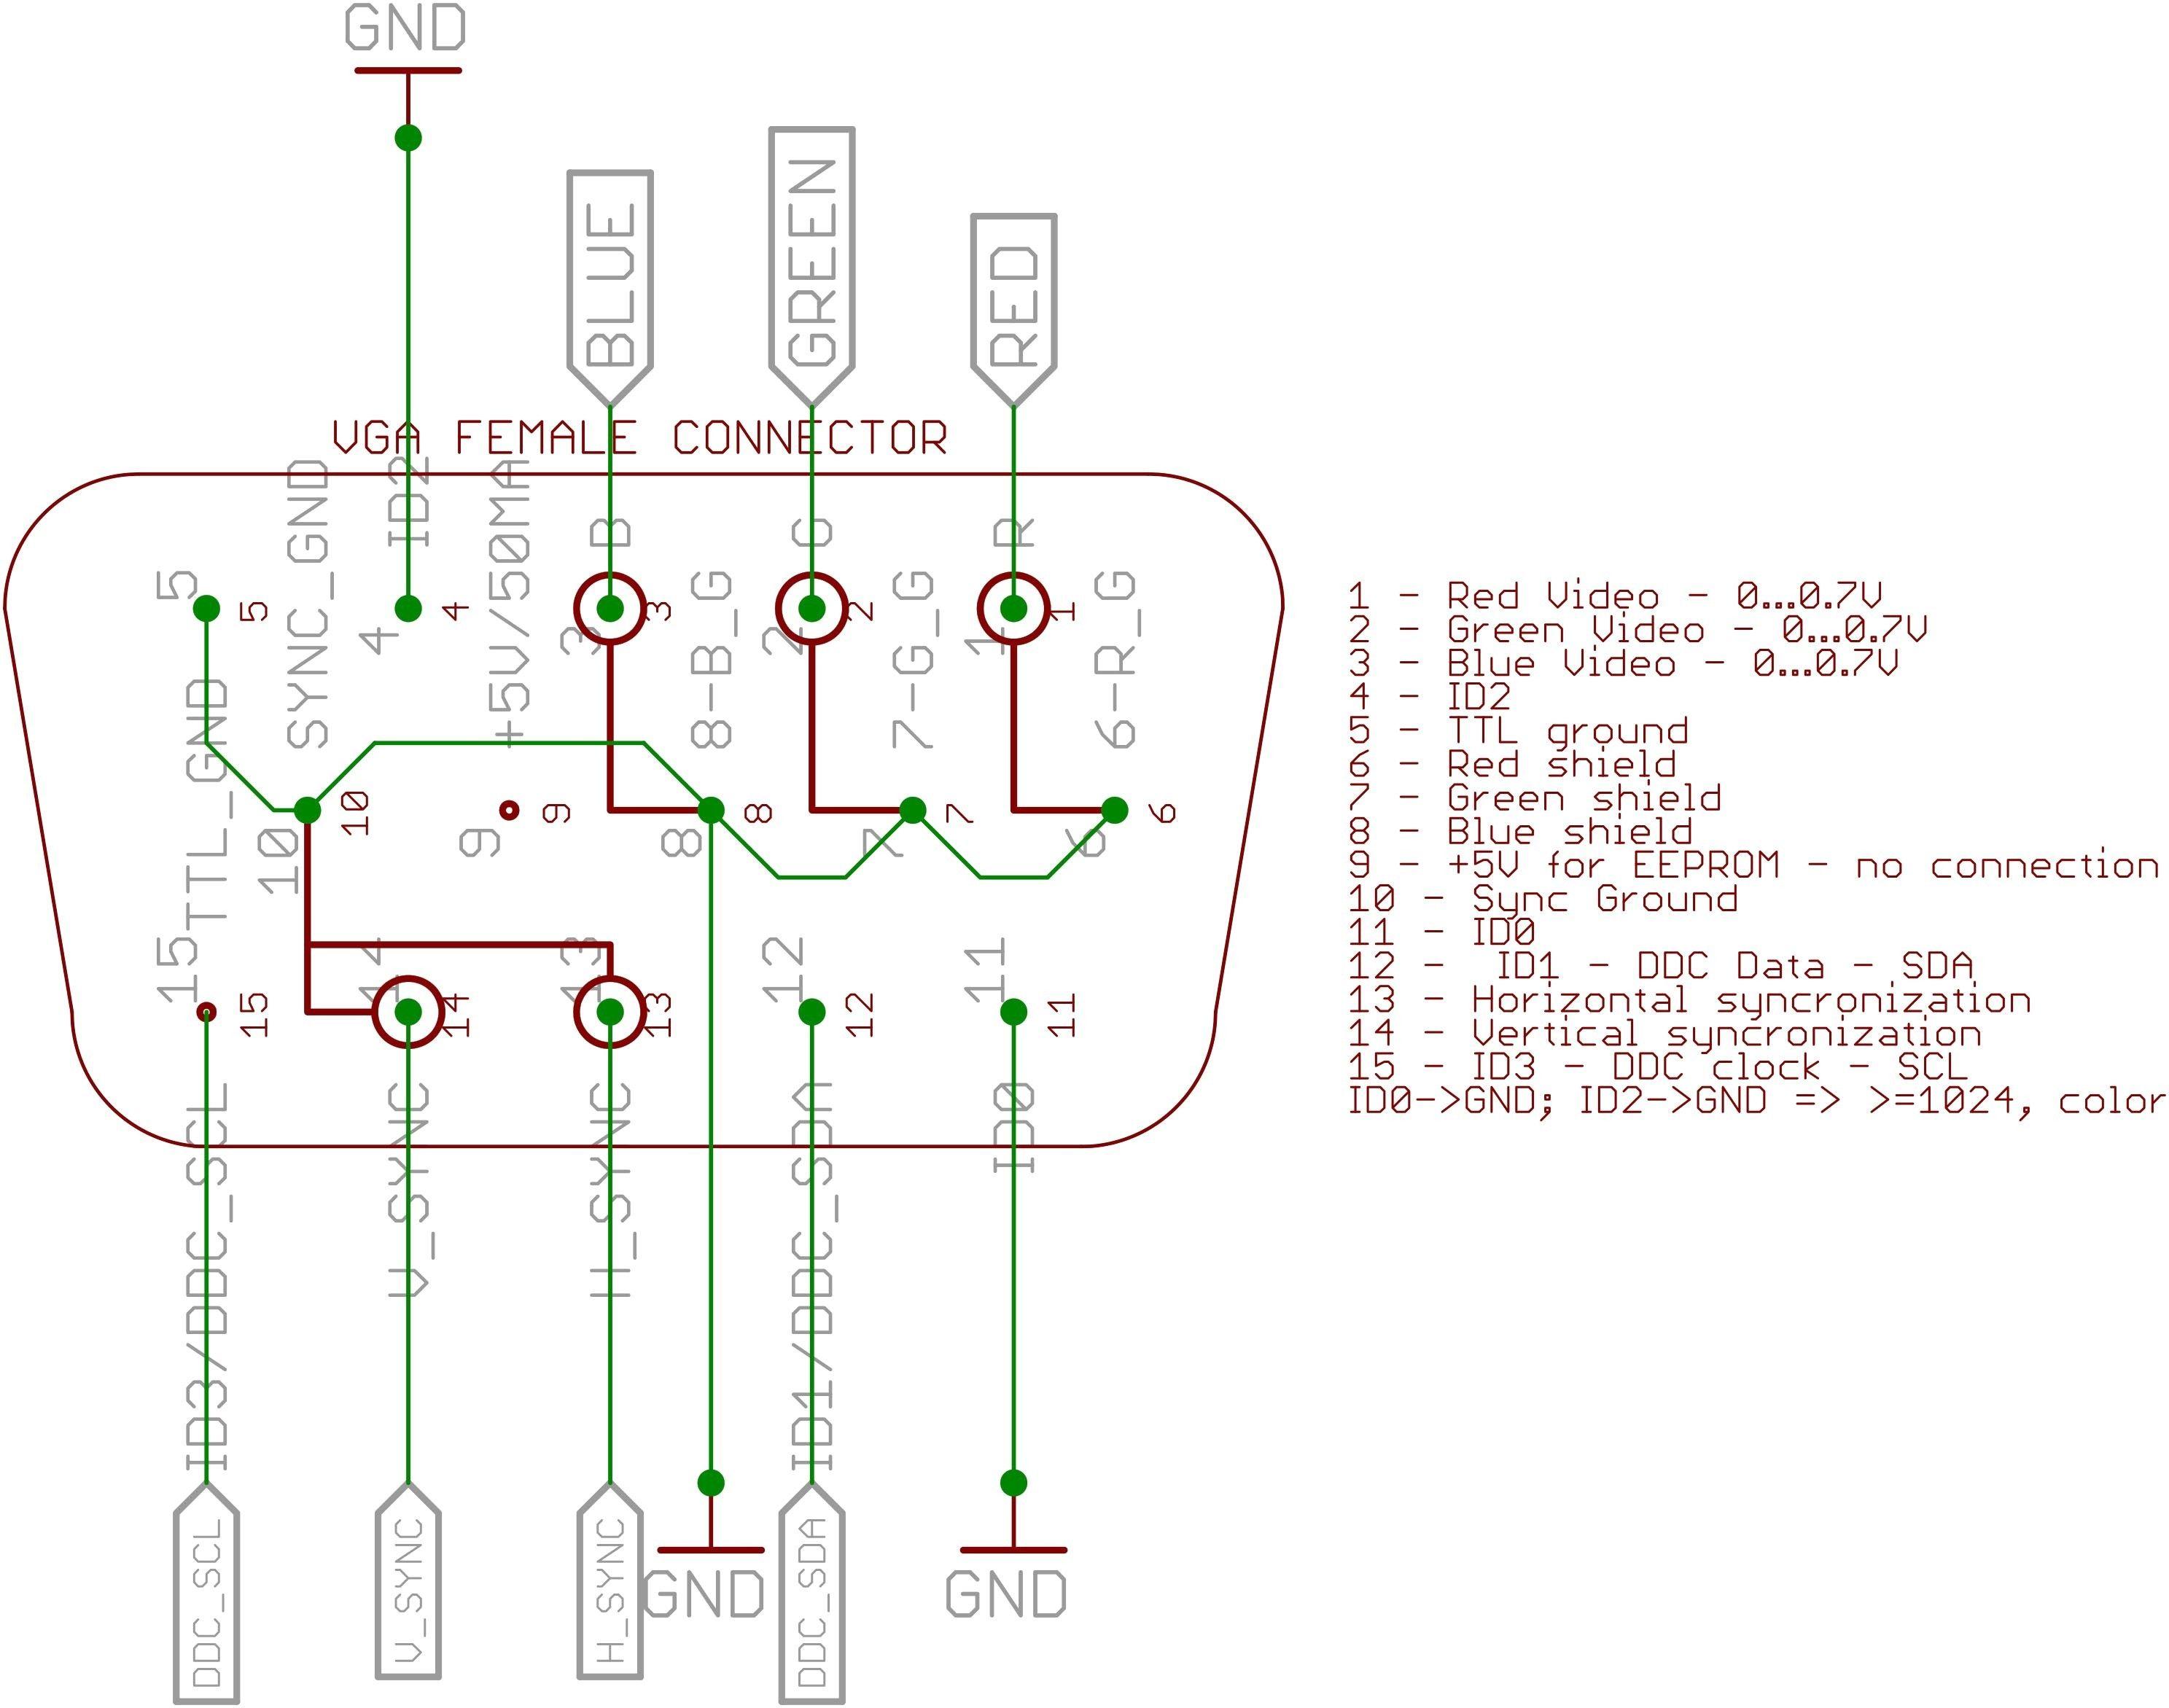 Vga To Rca Video Wiring Diagram in 2020 | Hdmi, Vga, Electronic schematicsPinterest